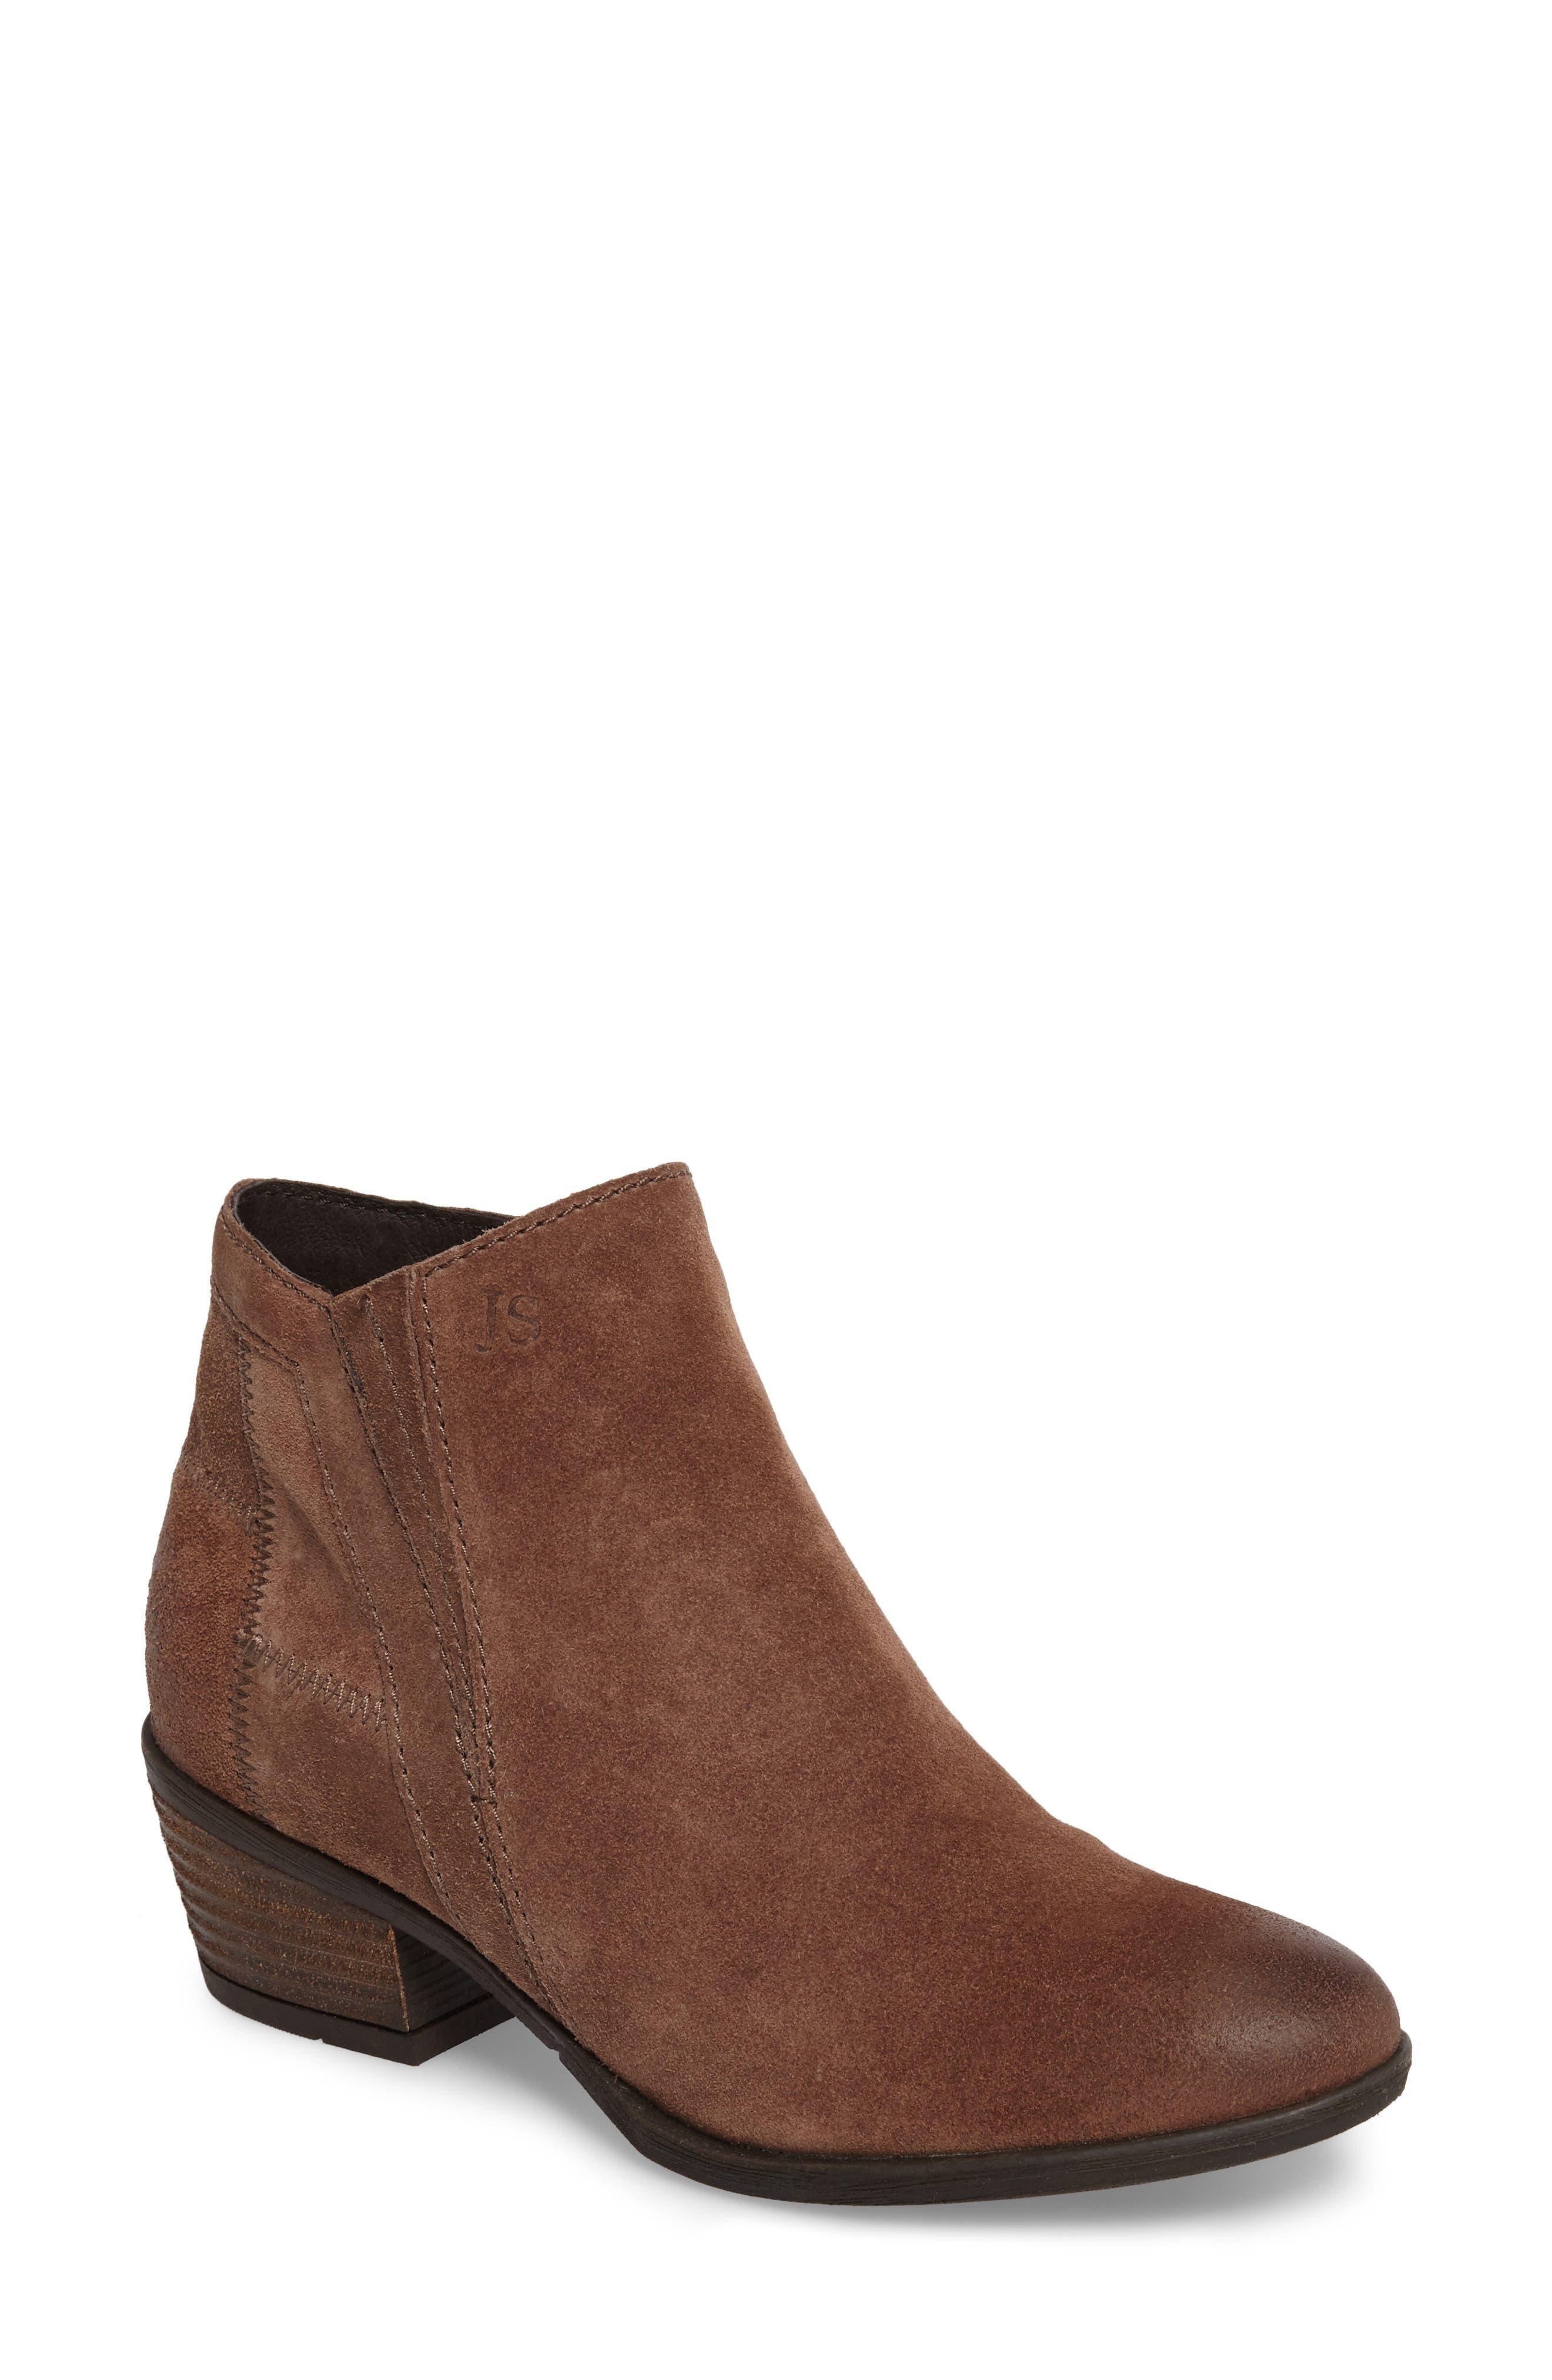 Daphne Bootie,                             Main thumbnail 1, color,                             Brown Leather